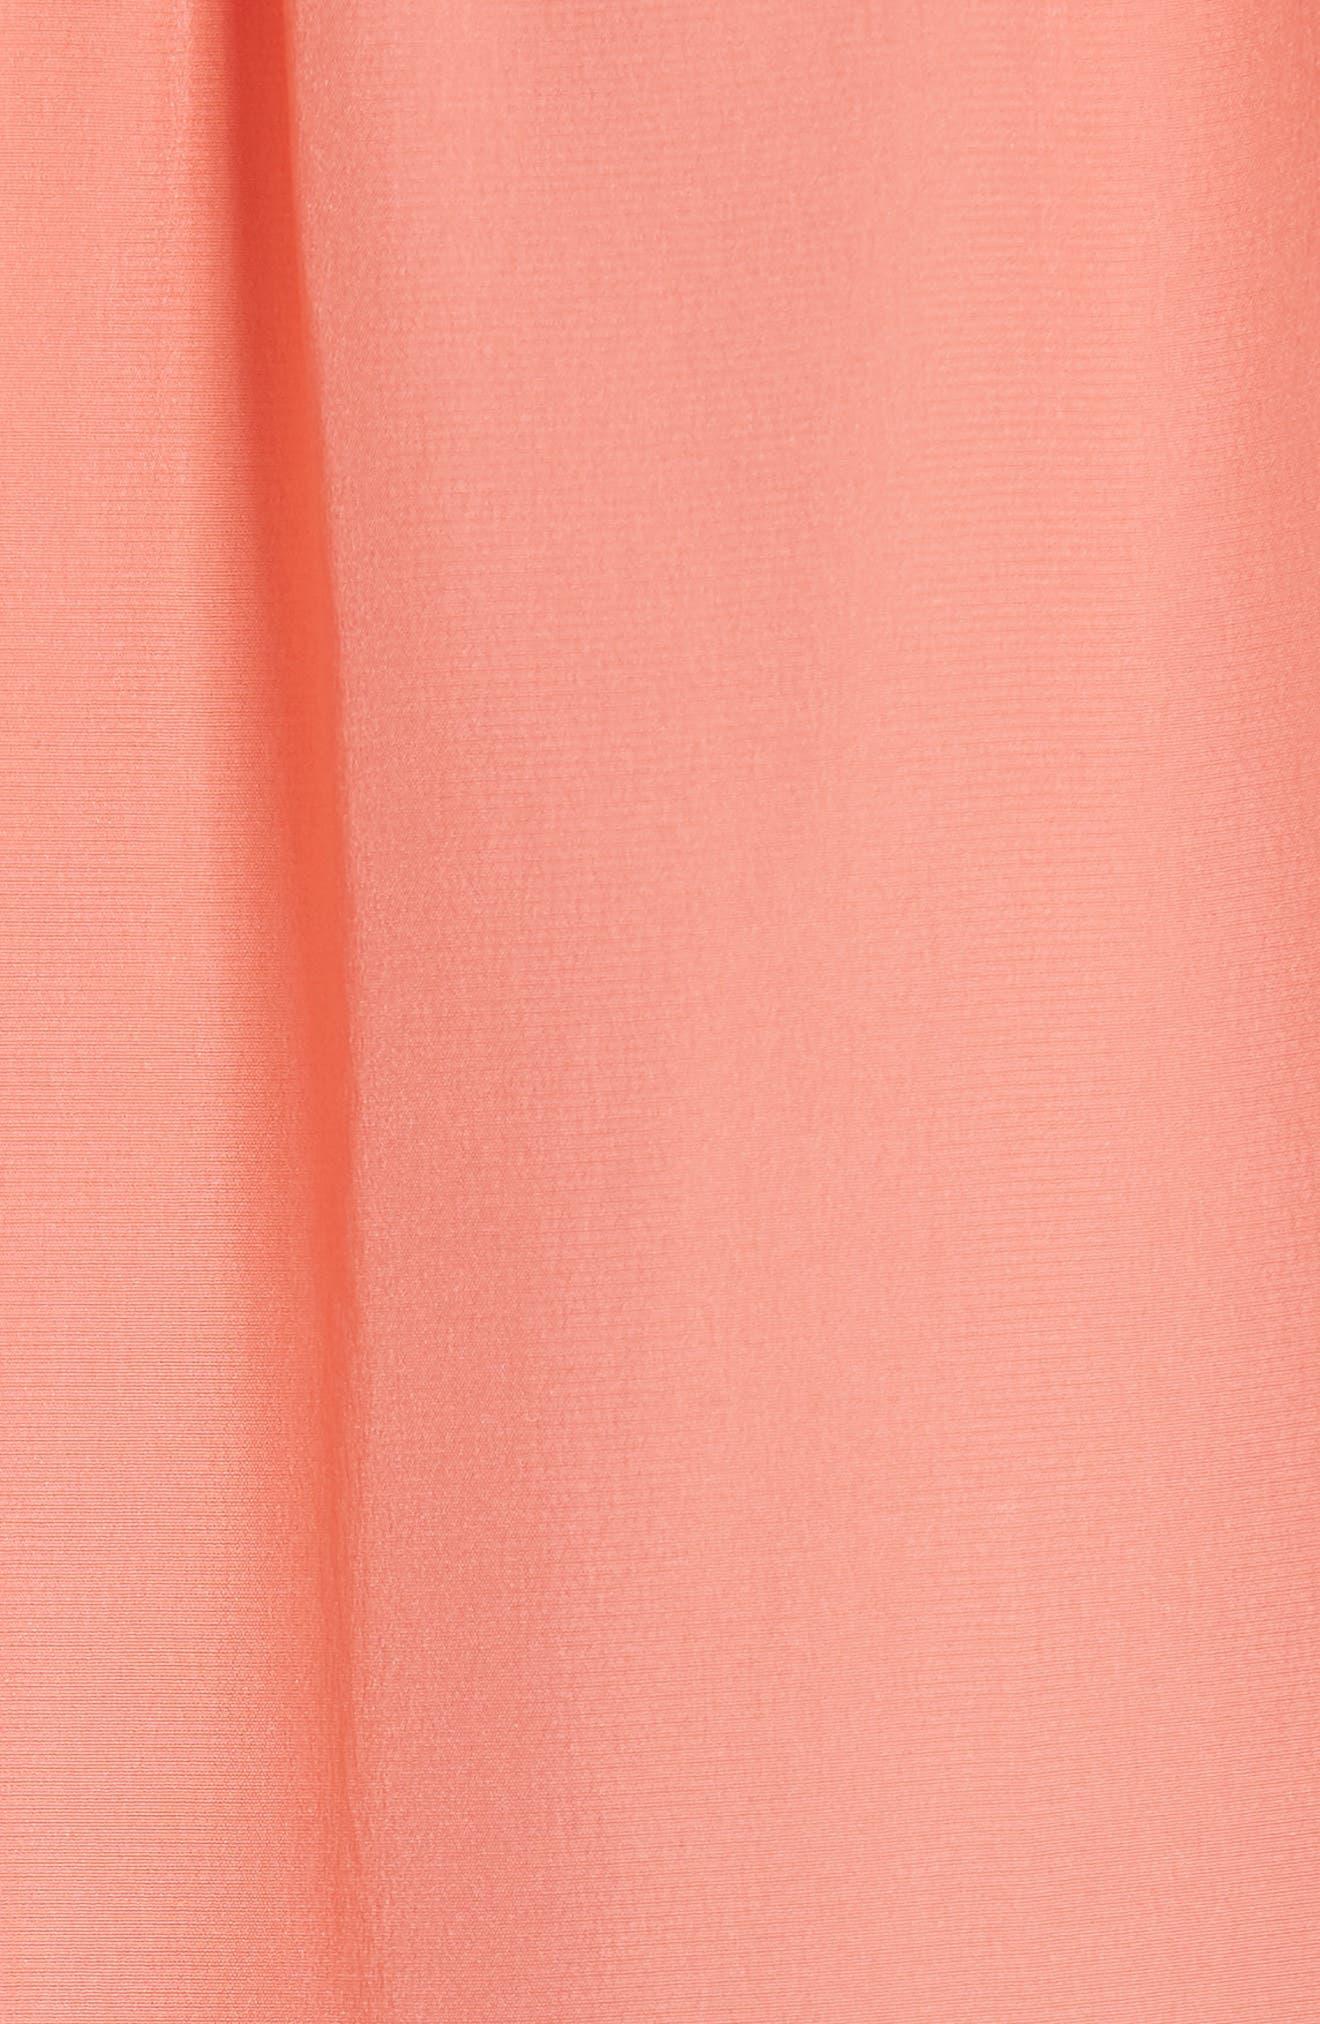 ruffle sleeve silk top,                             Alternate thumbnail 5, color,                             APRICOT SORBET